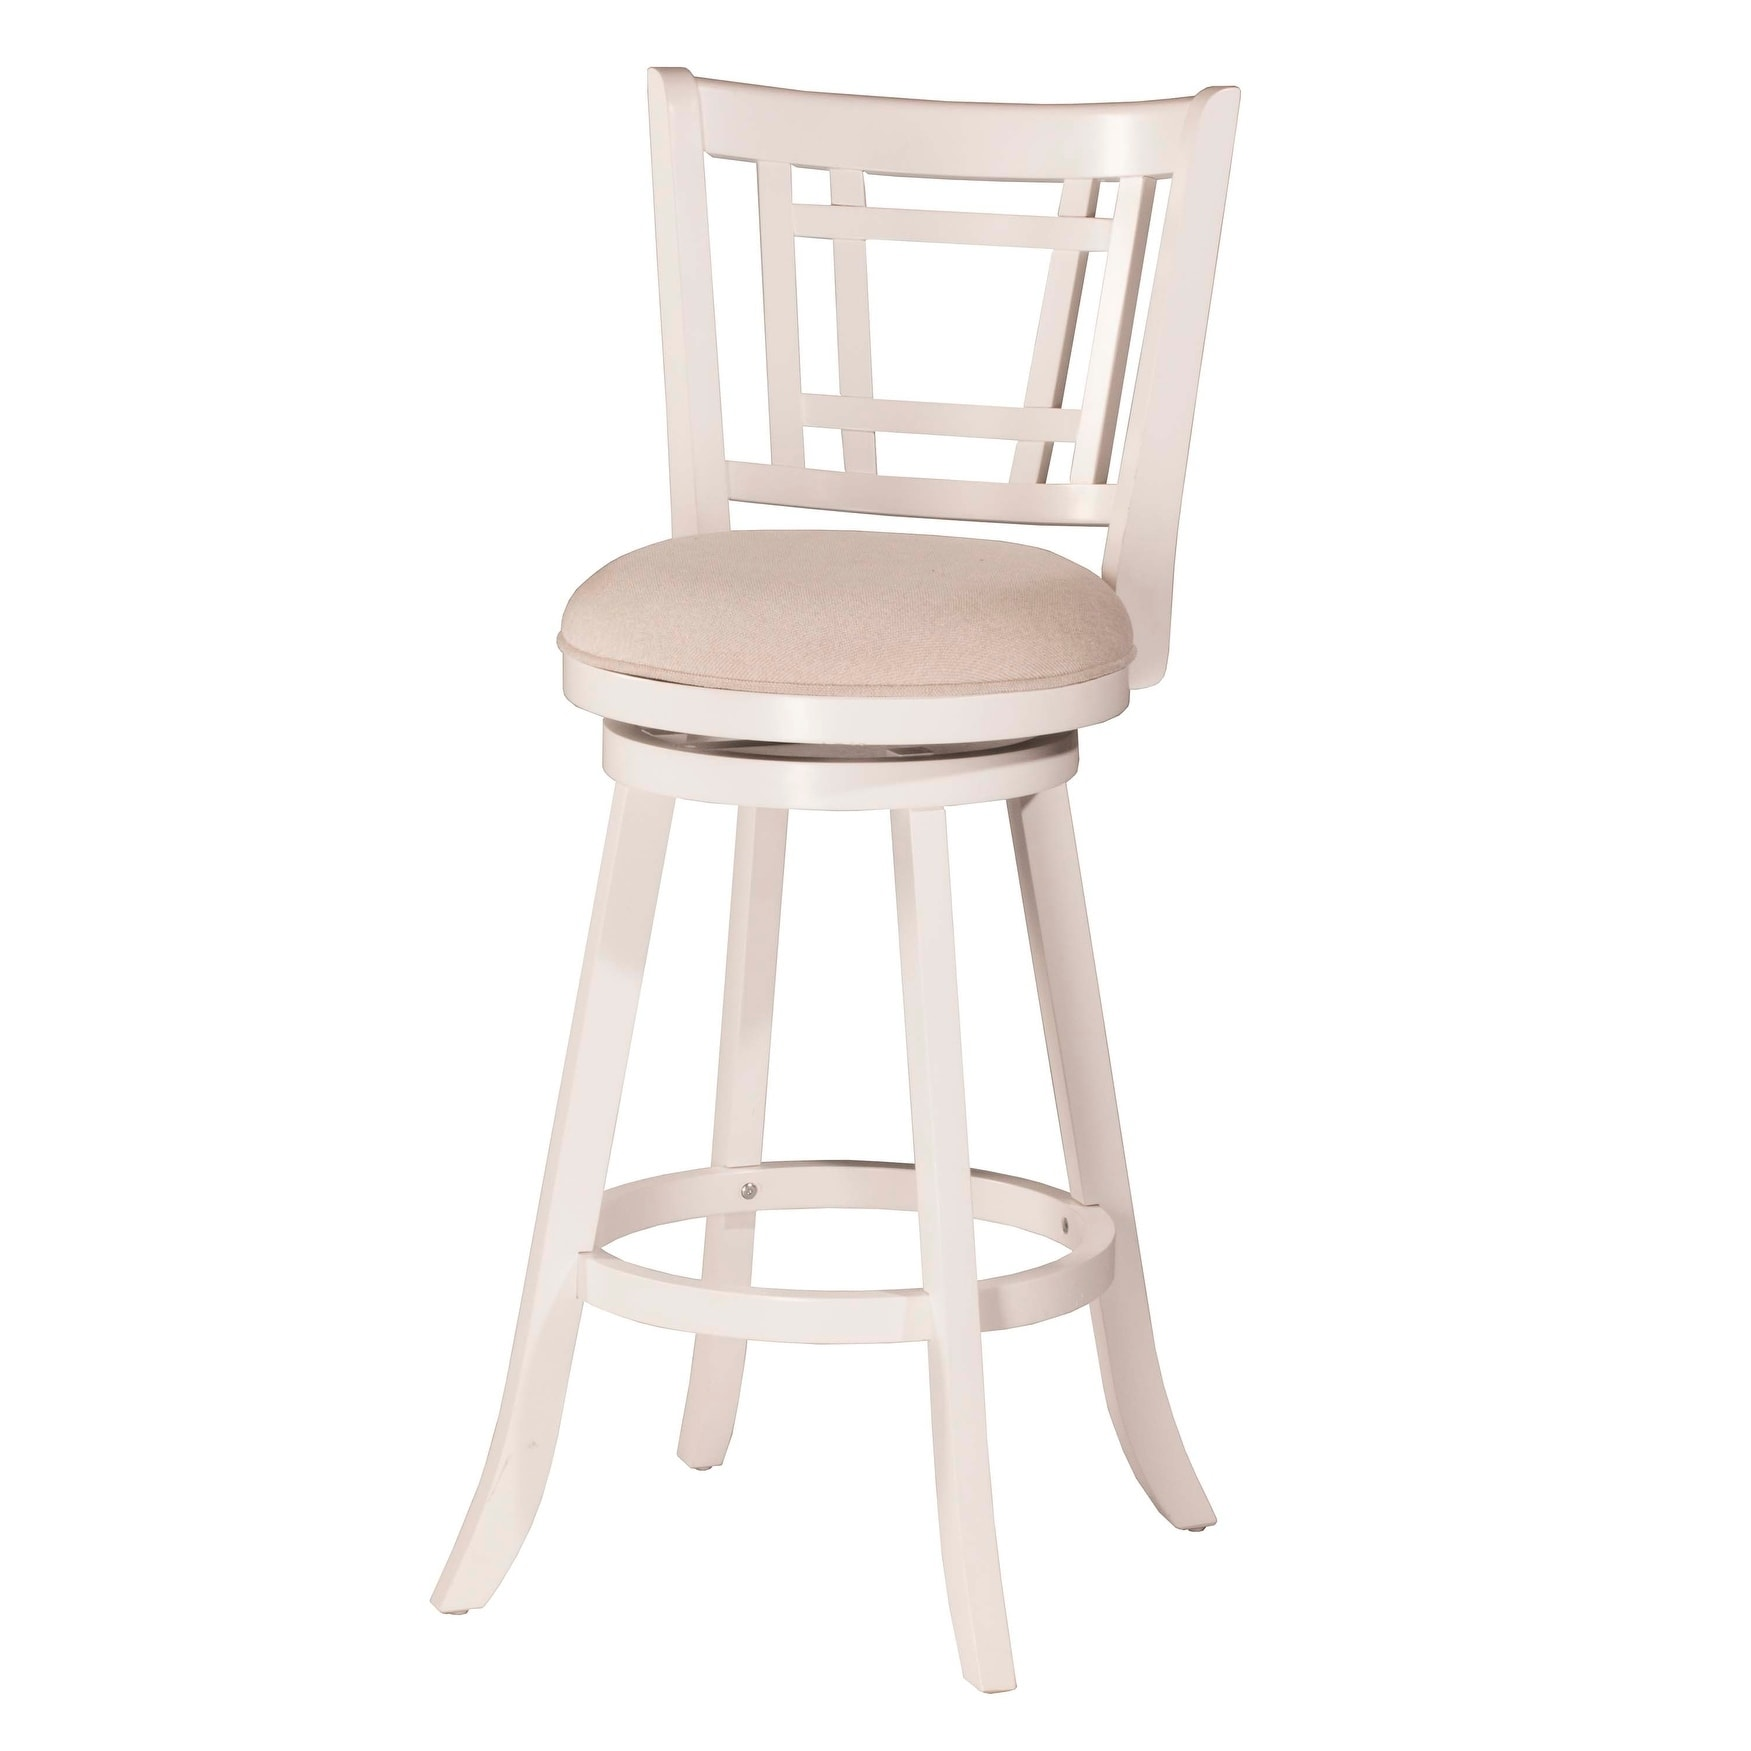 Pleasant Hillsdale Furniture Fairfox Swivel Counter Stool White 25 Lamtechconsult Wood Chair Design Ideas Lamtechconsultcom